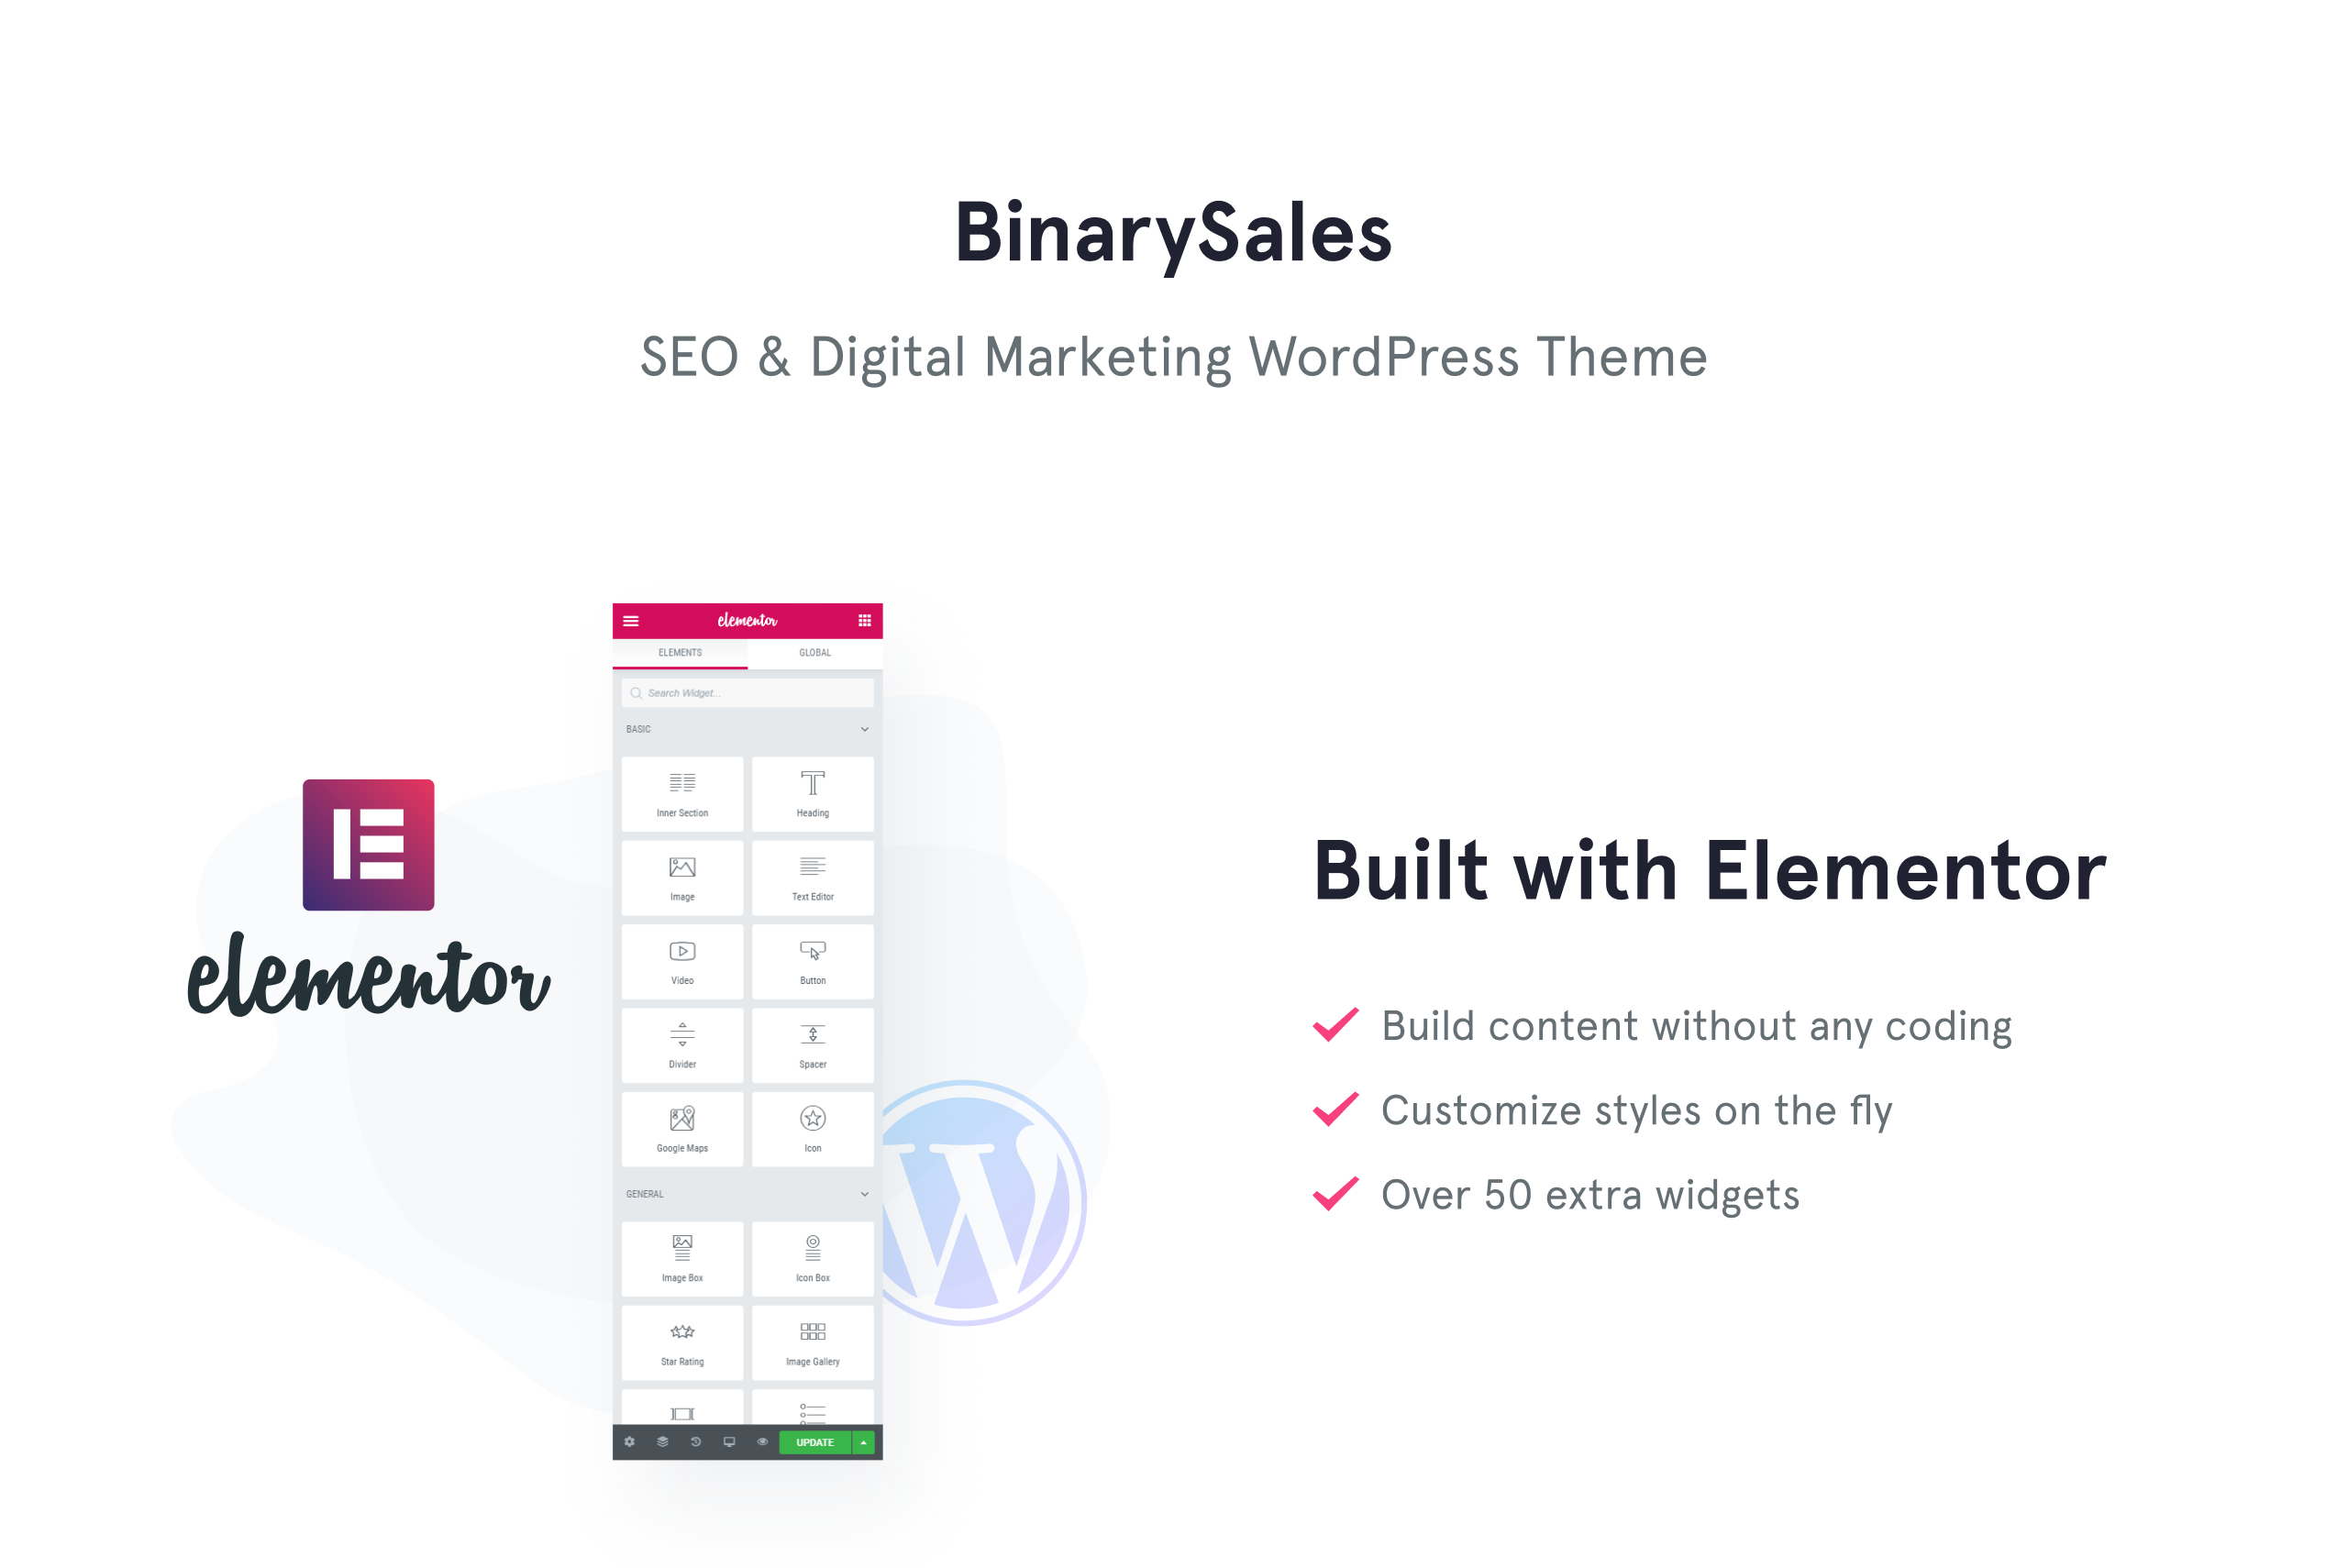 BinarySales - SEO & Digital Marketing WordPress Theme